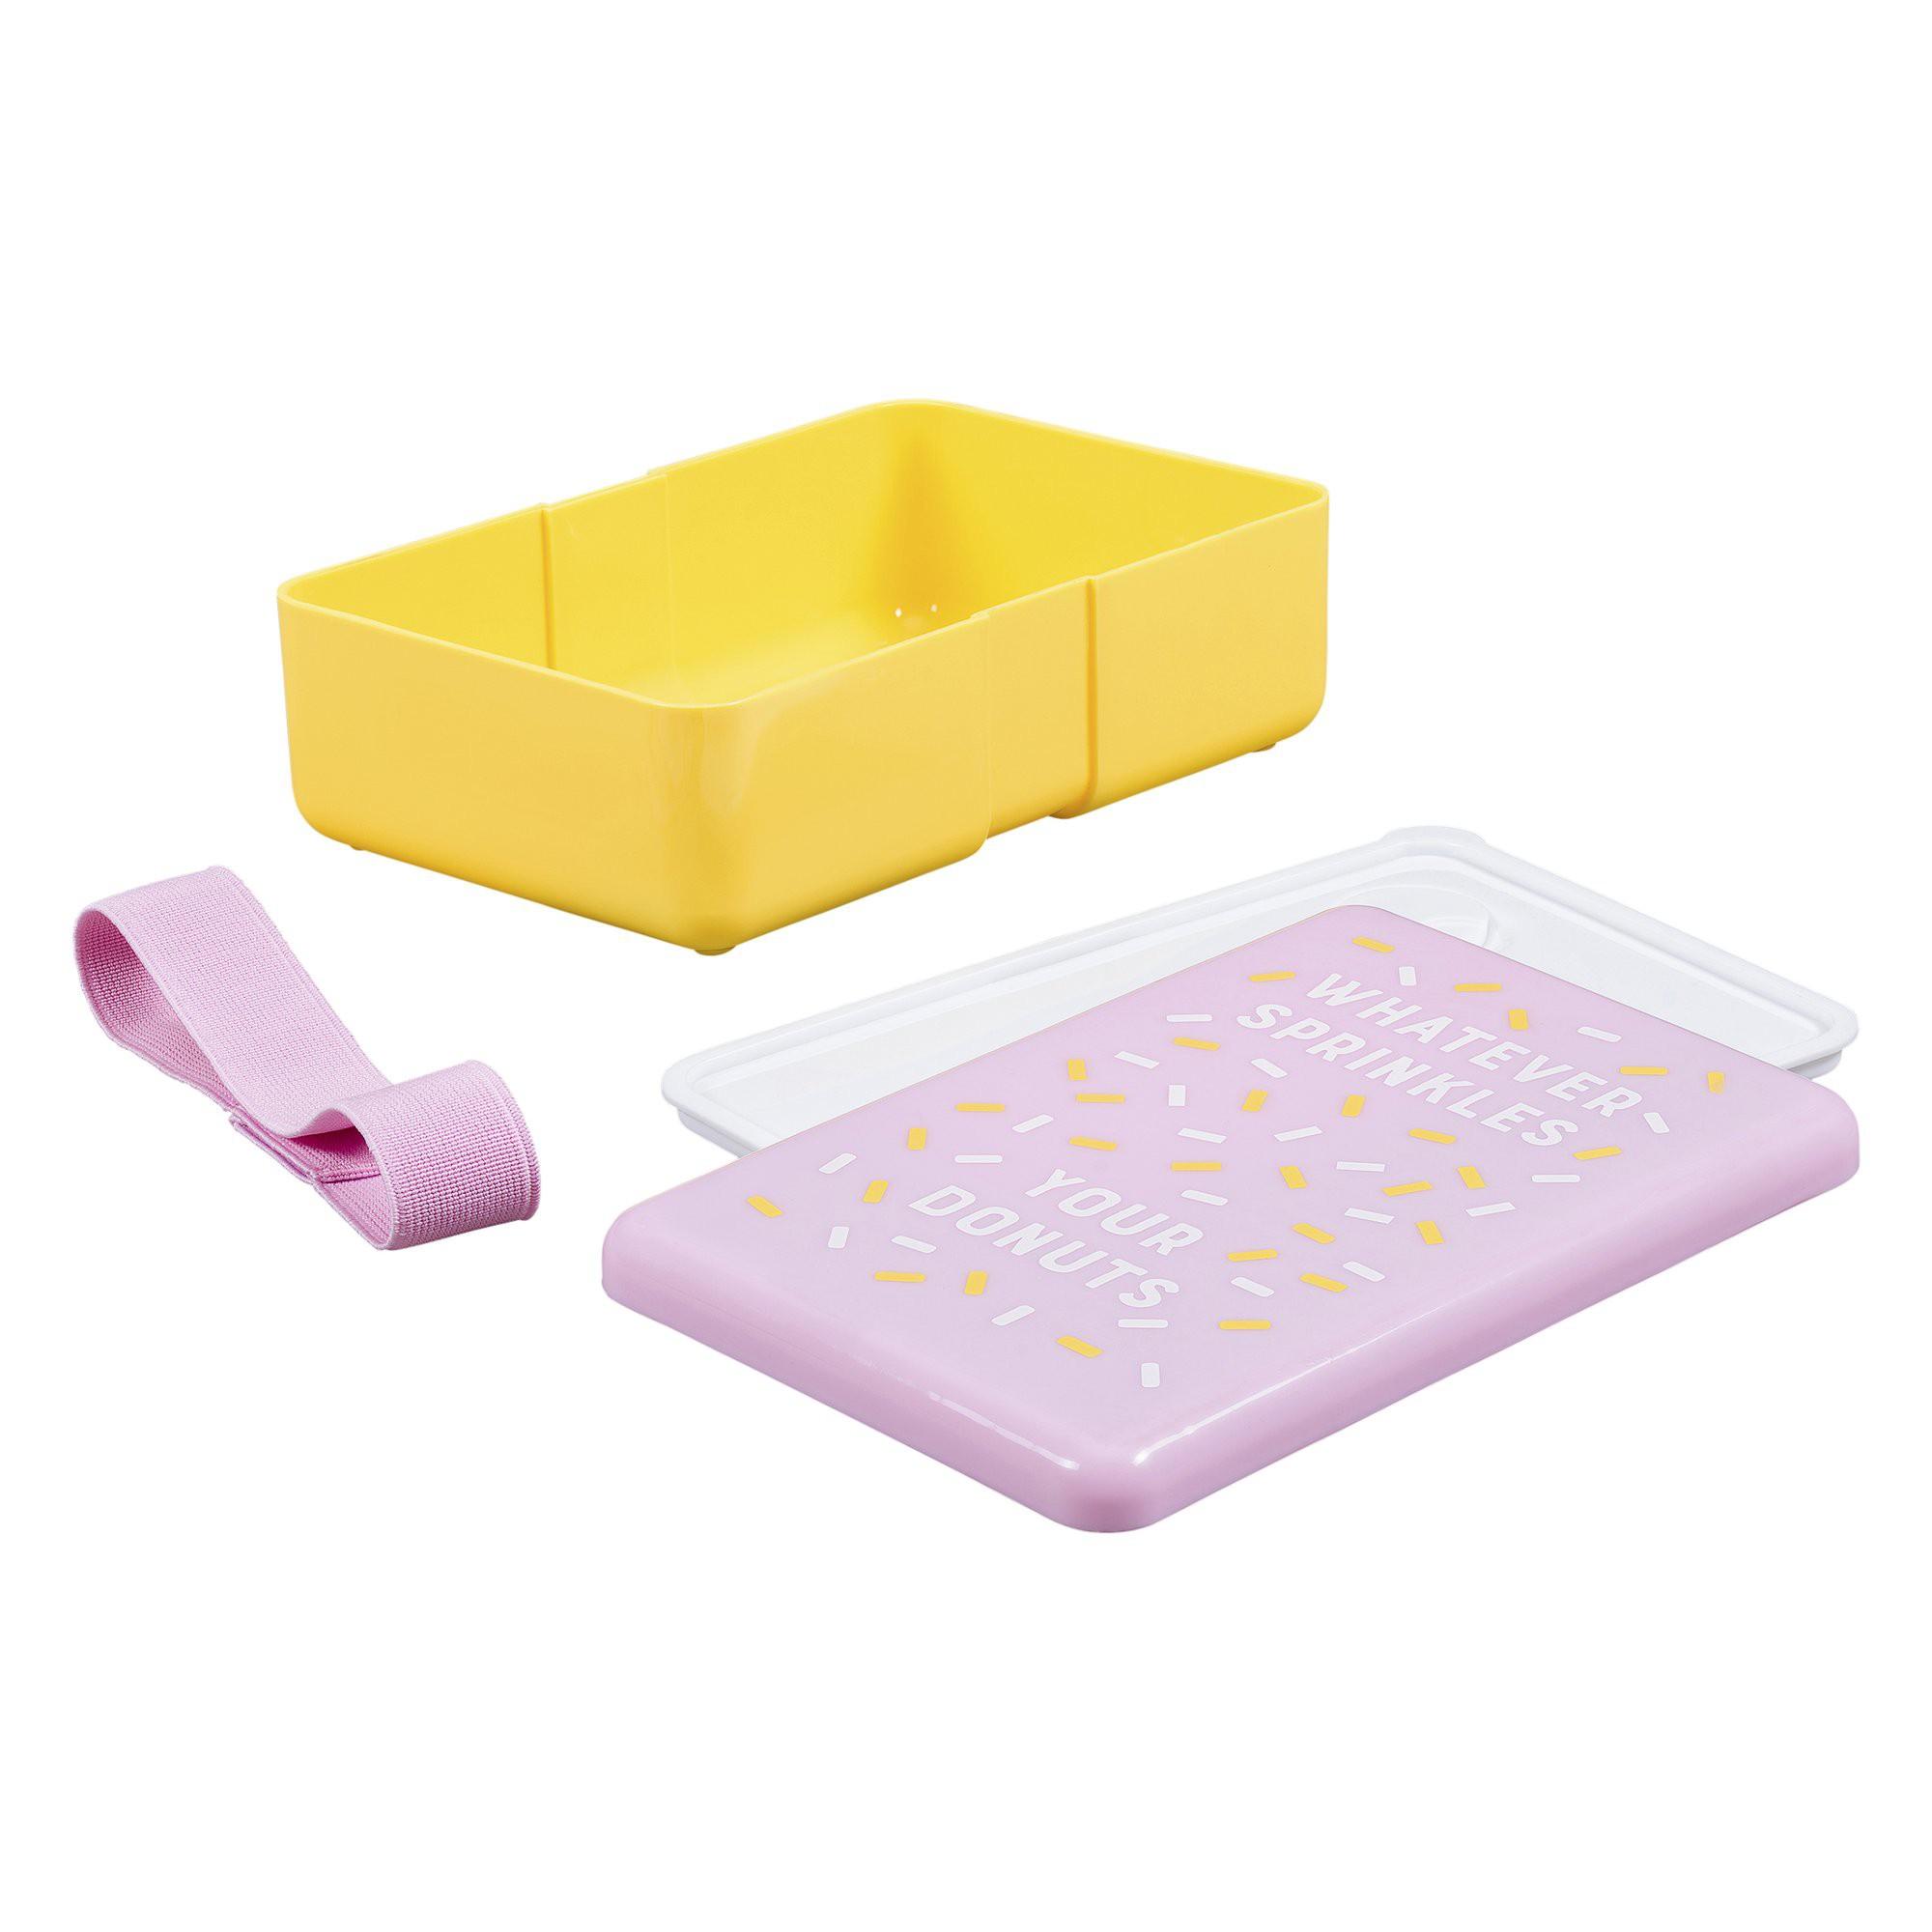 Lunch box Sprinkles - Yes Studio